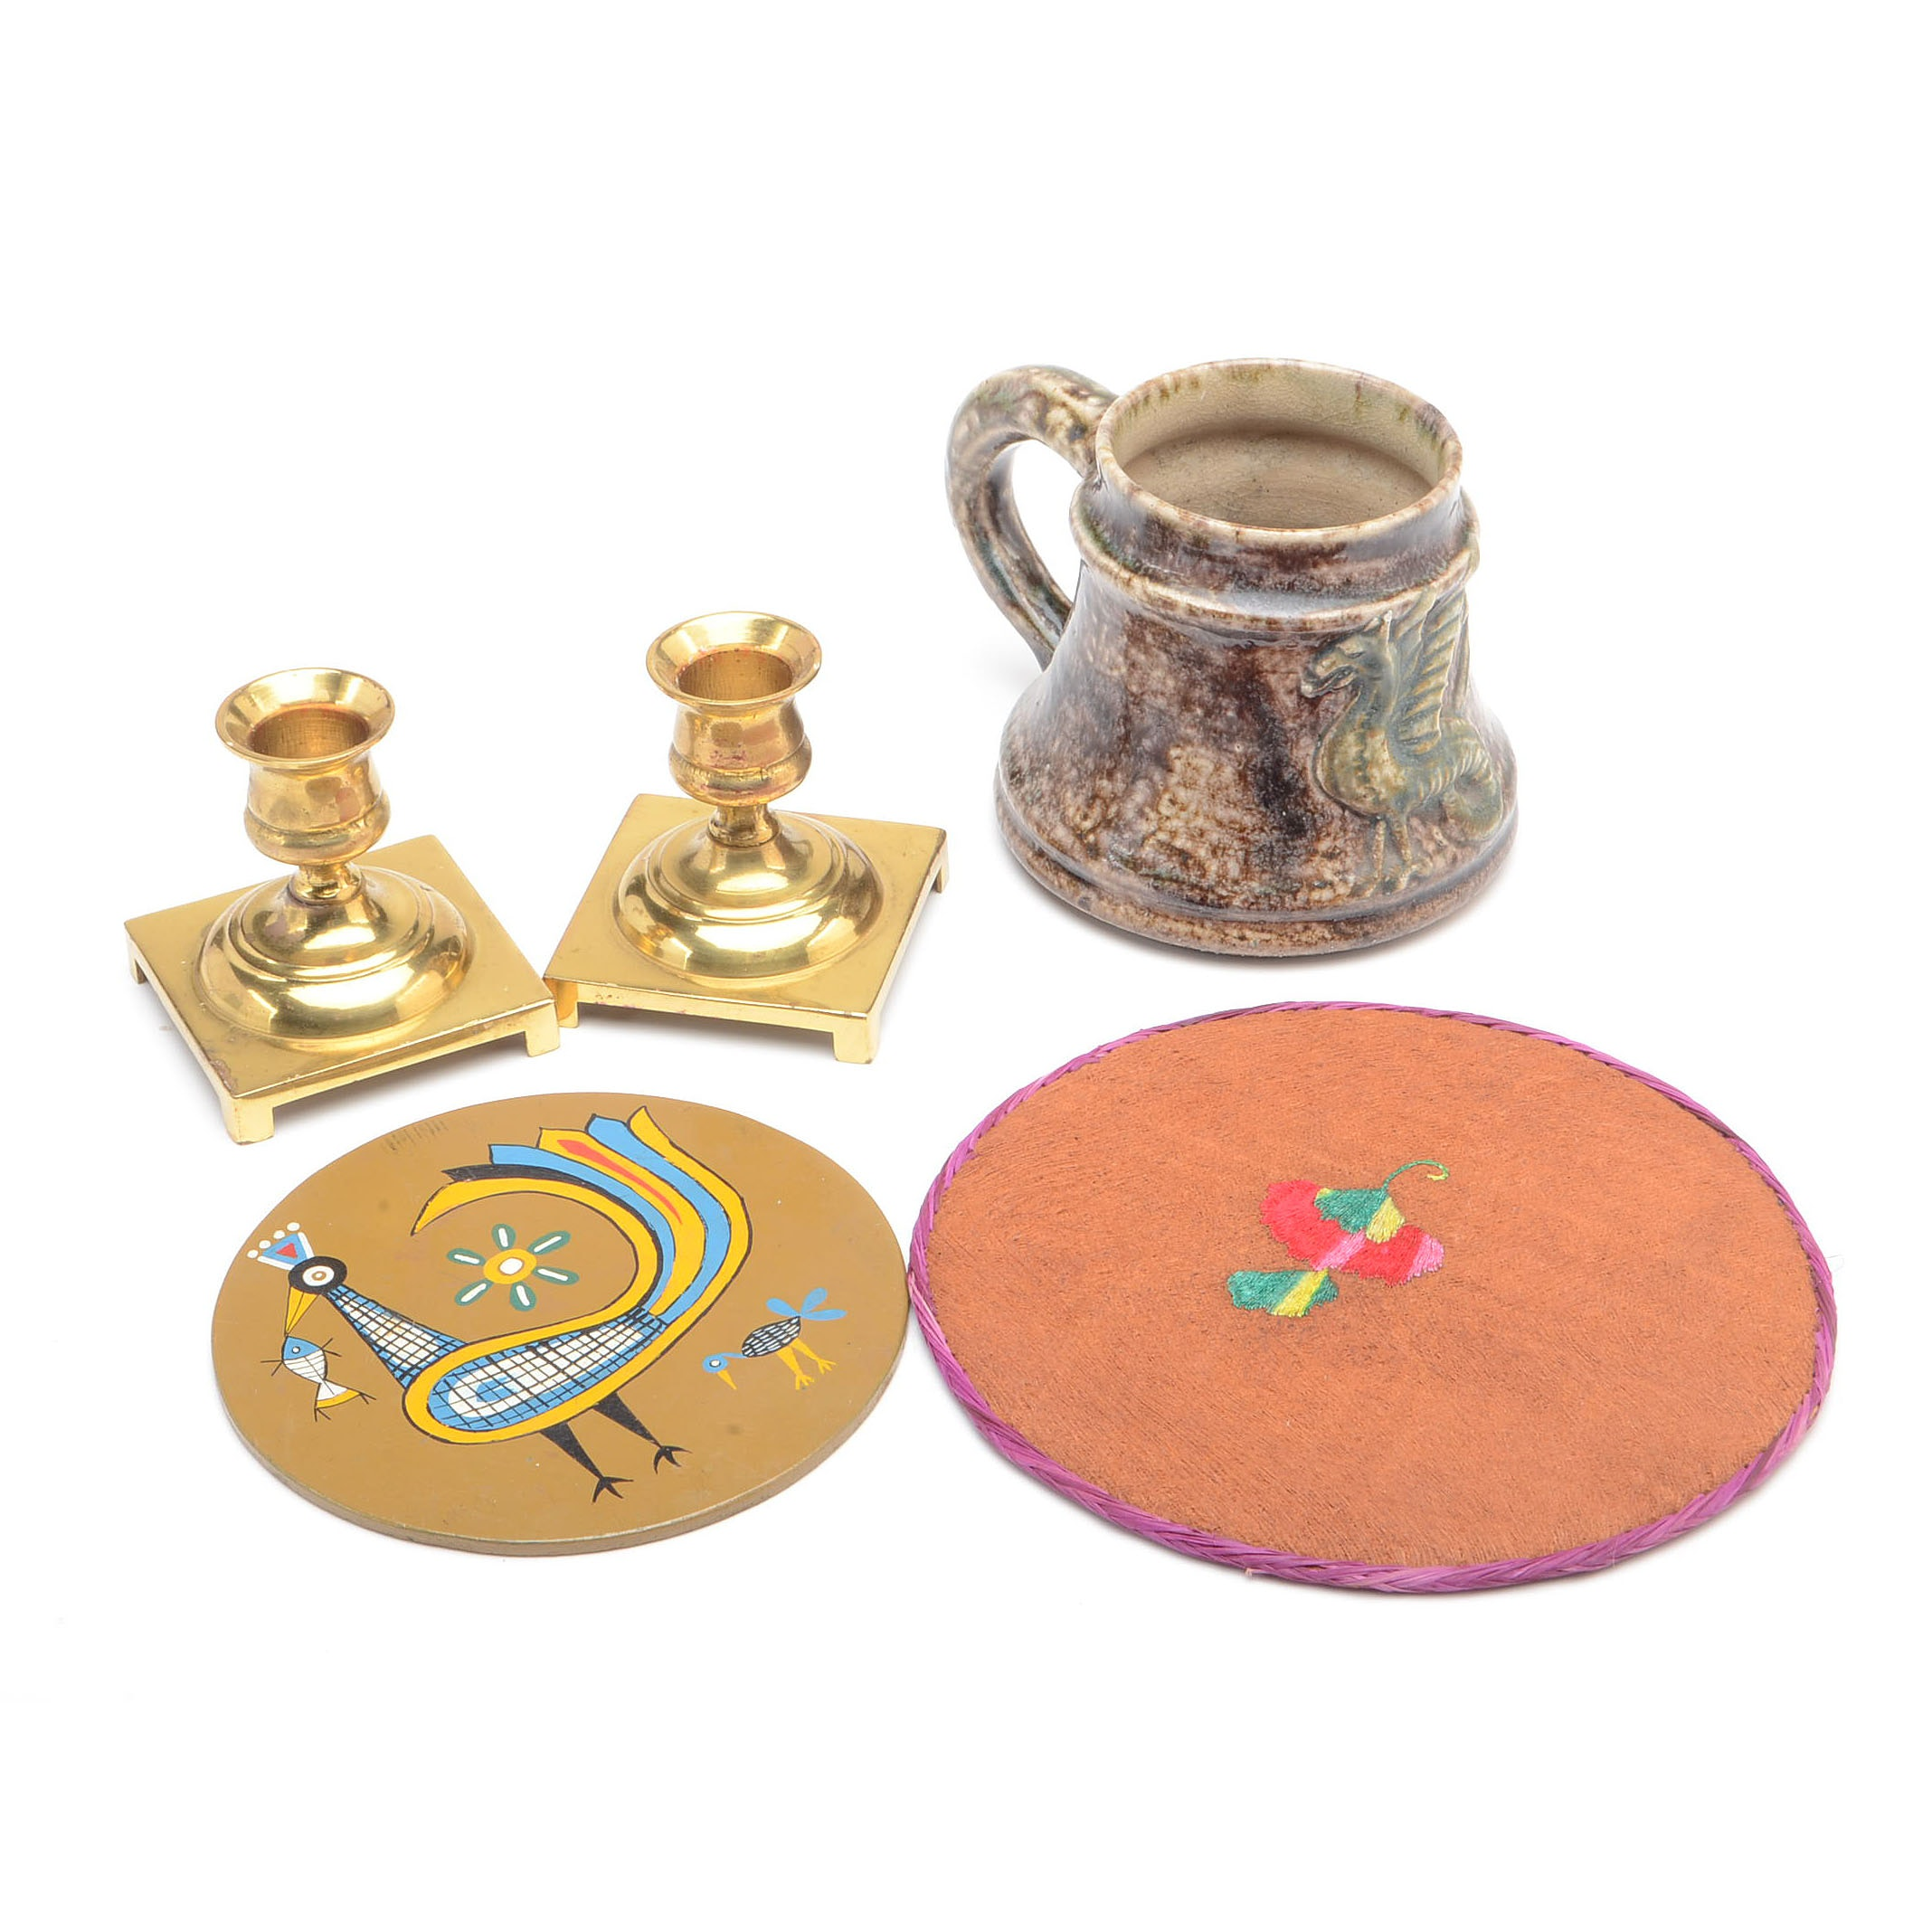 English Brass Candlesticks and Decor